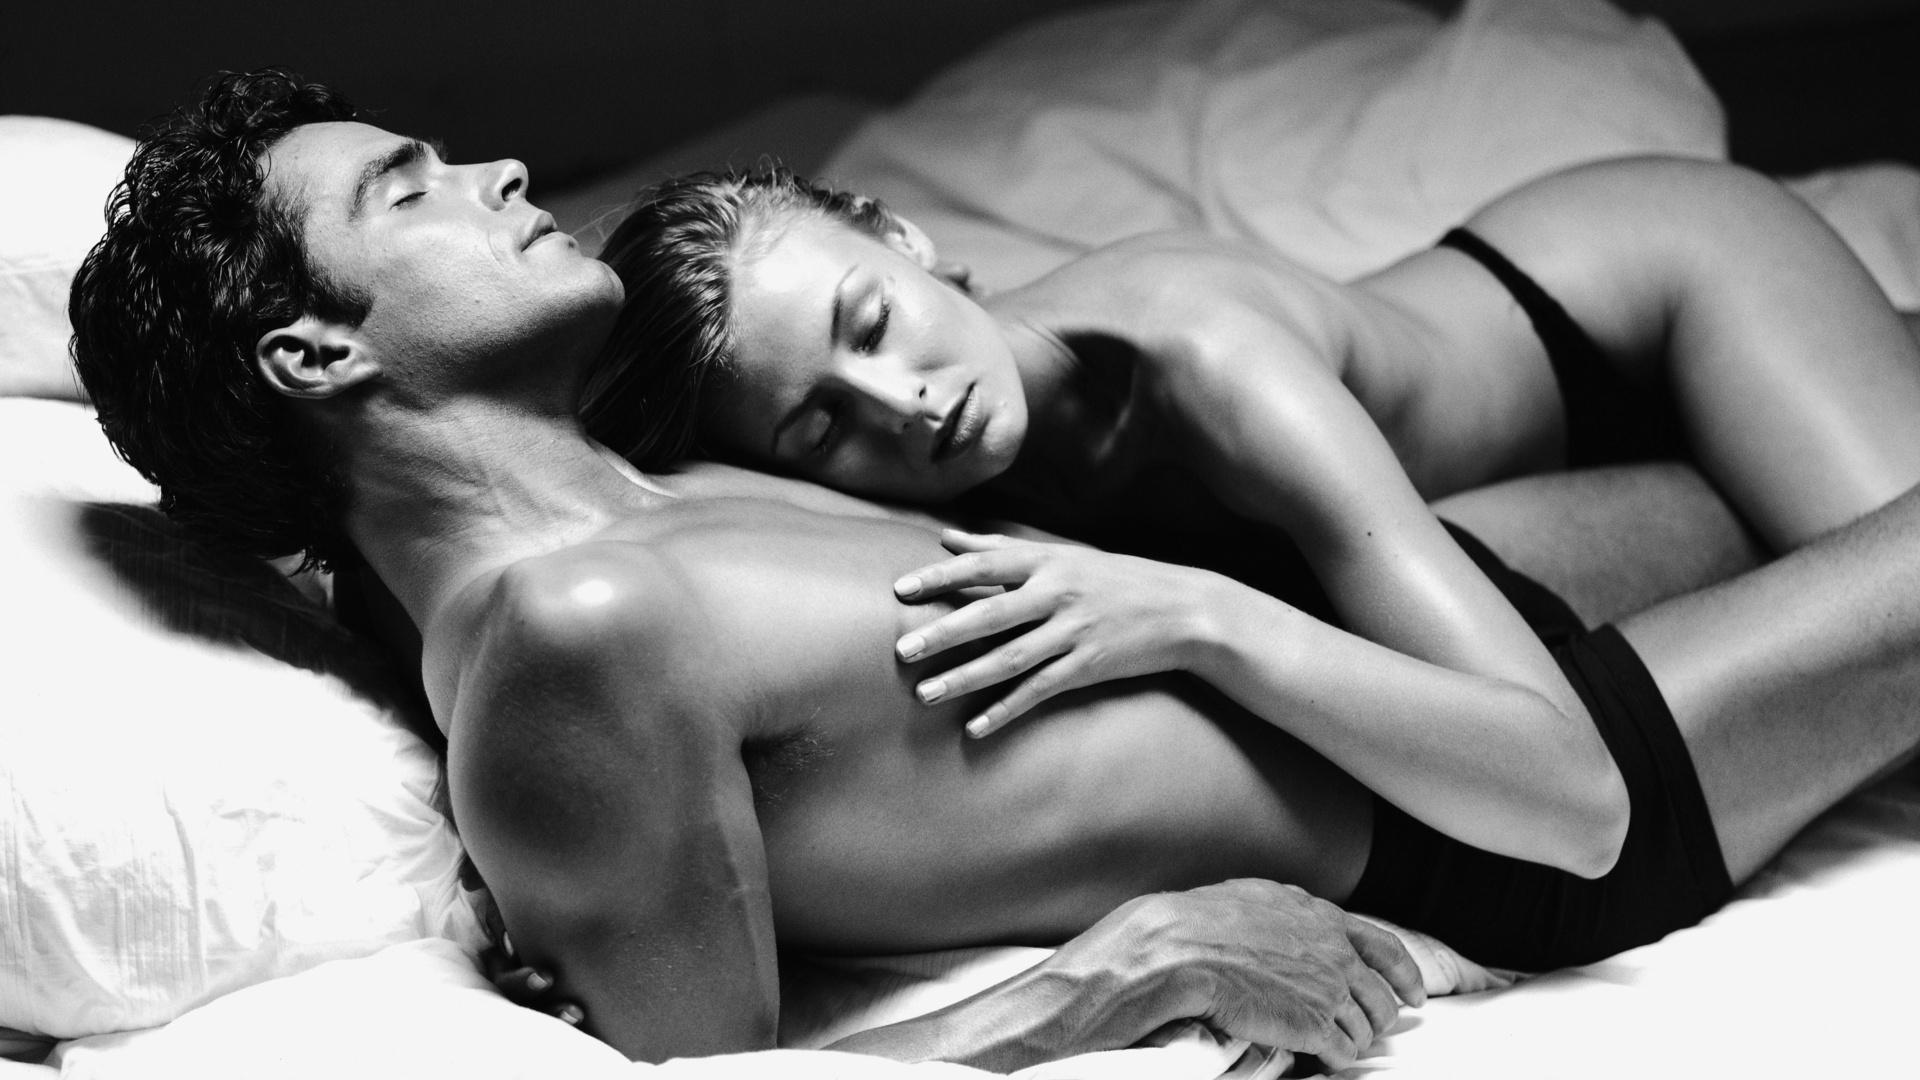 Красивая эротика мужчина и женщина фото